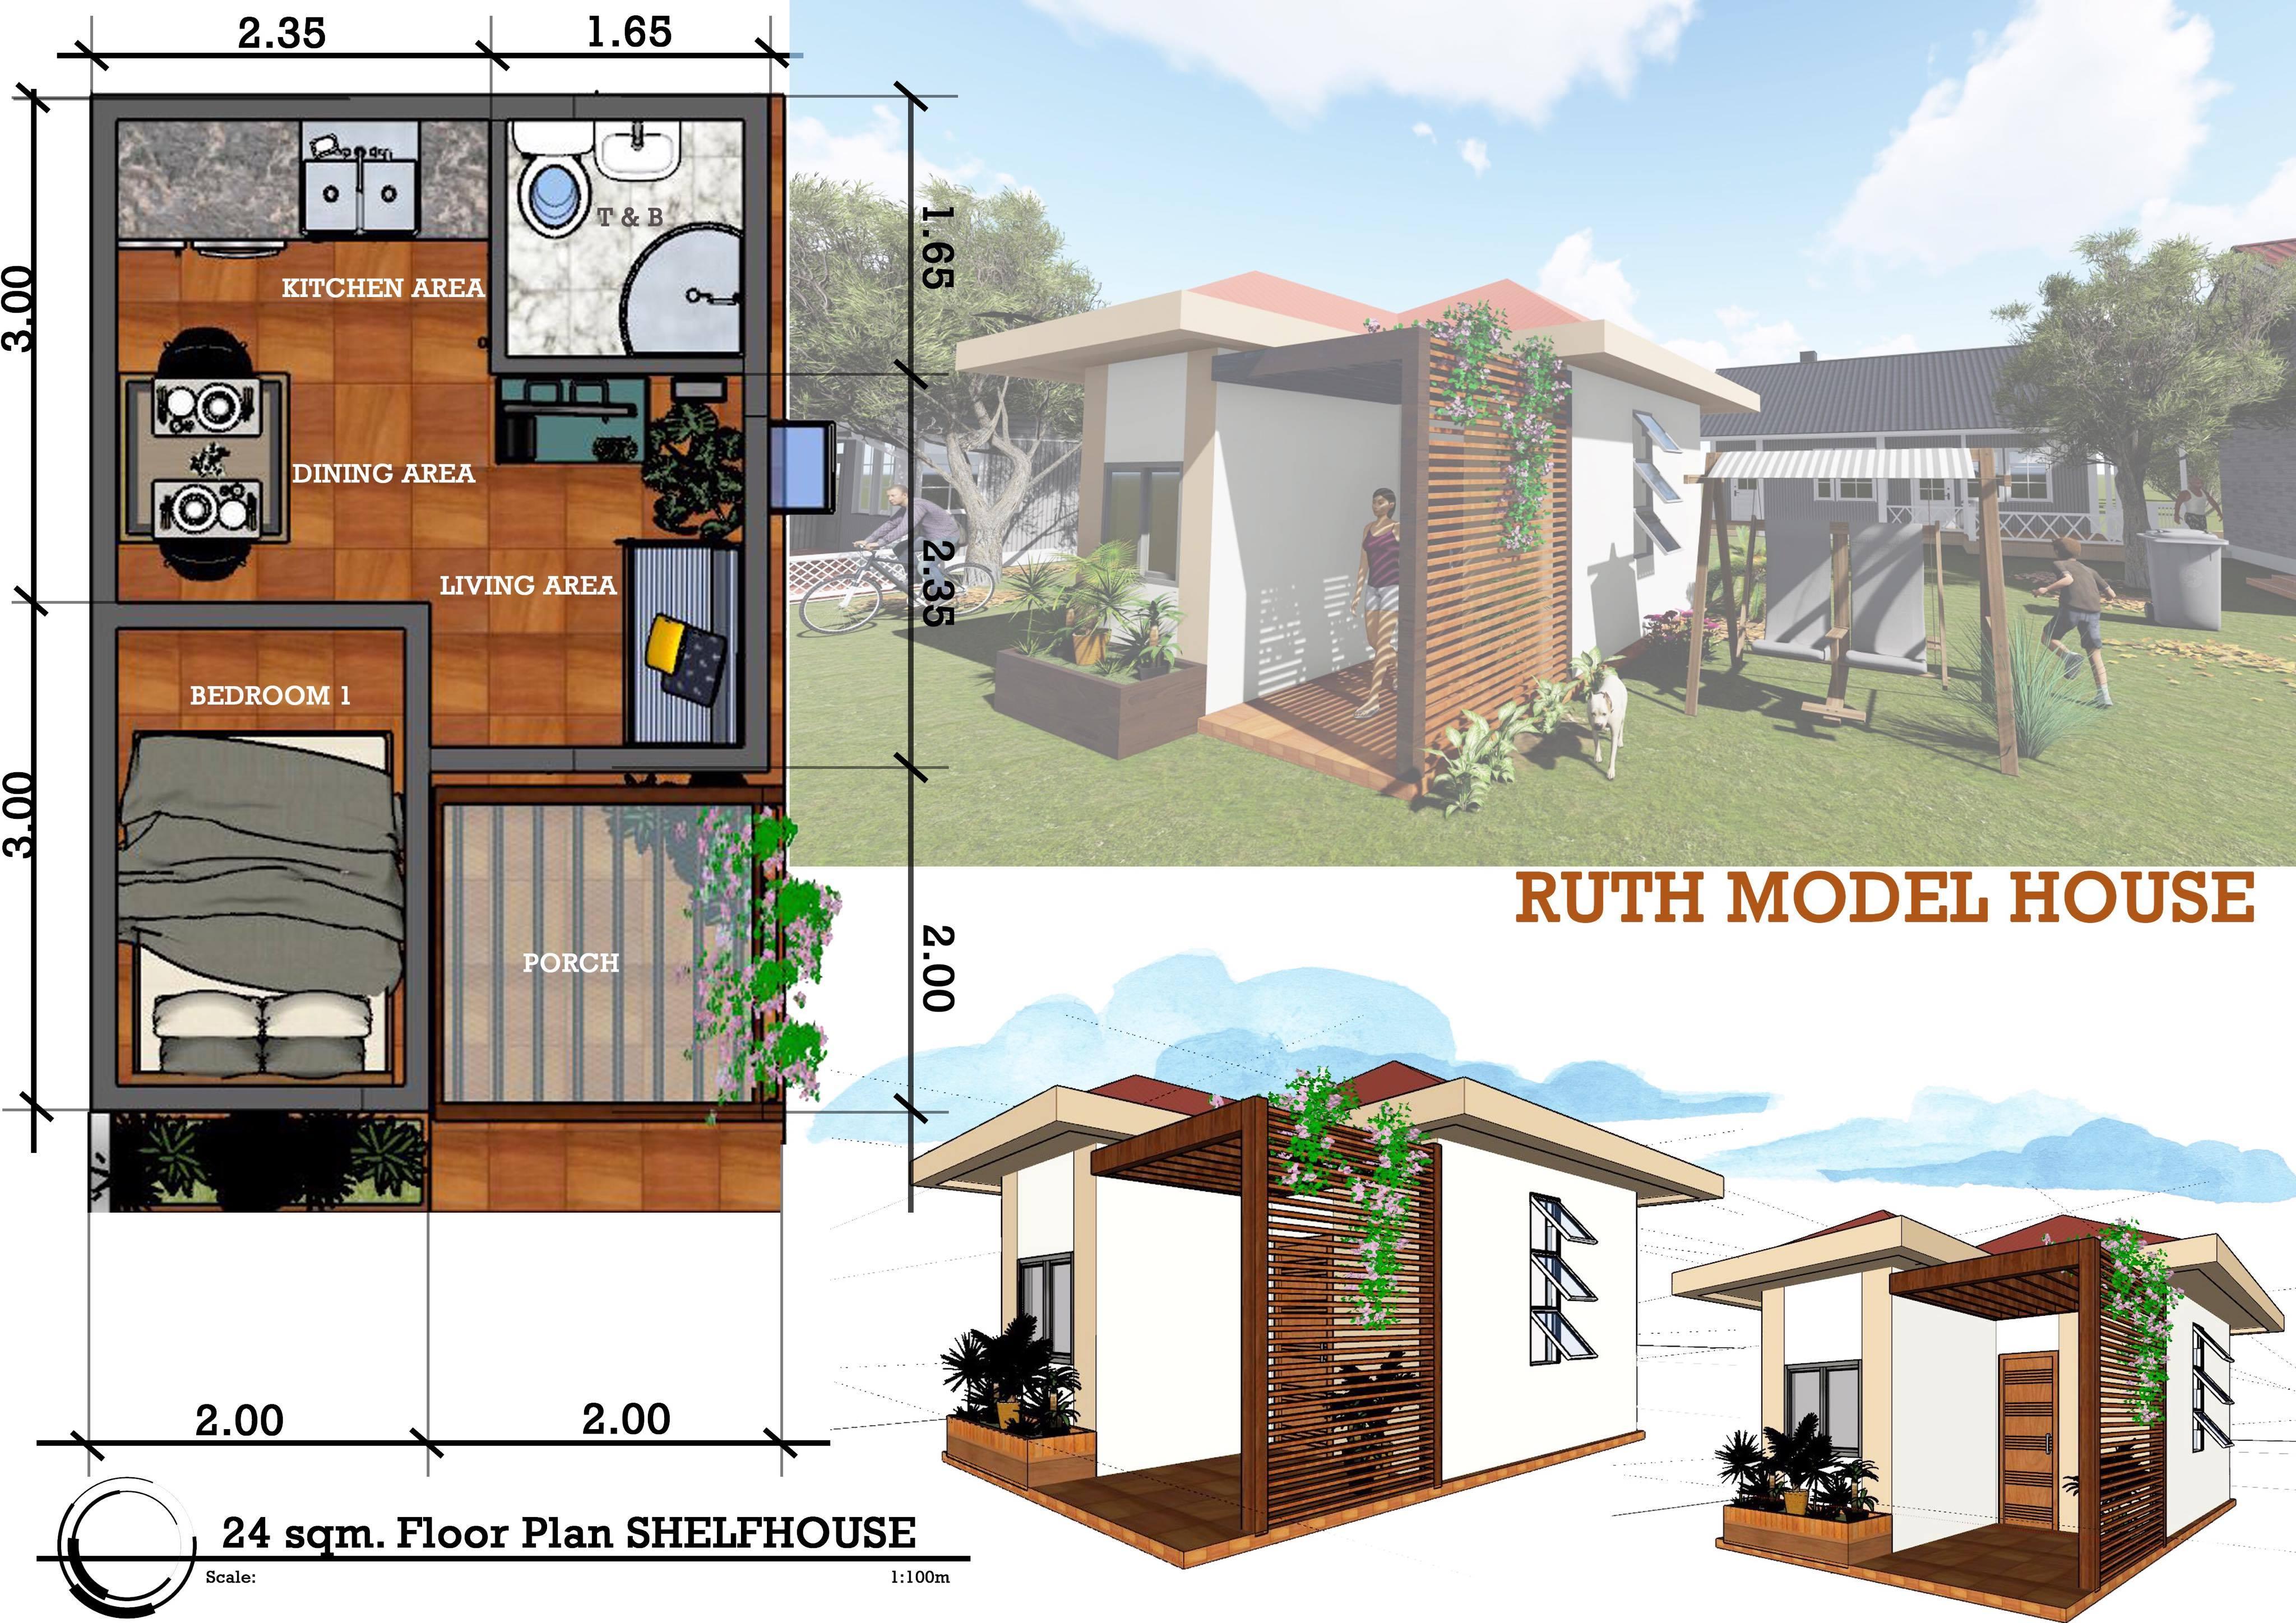 Ruth Model house